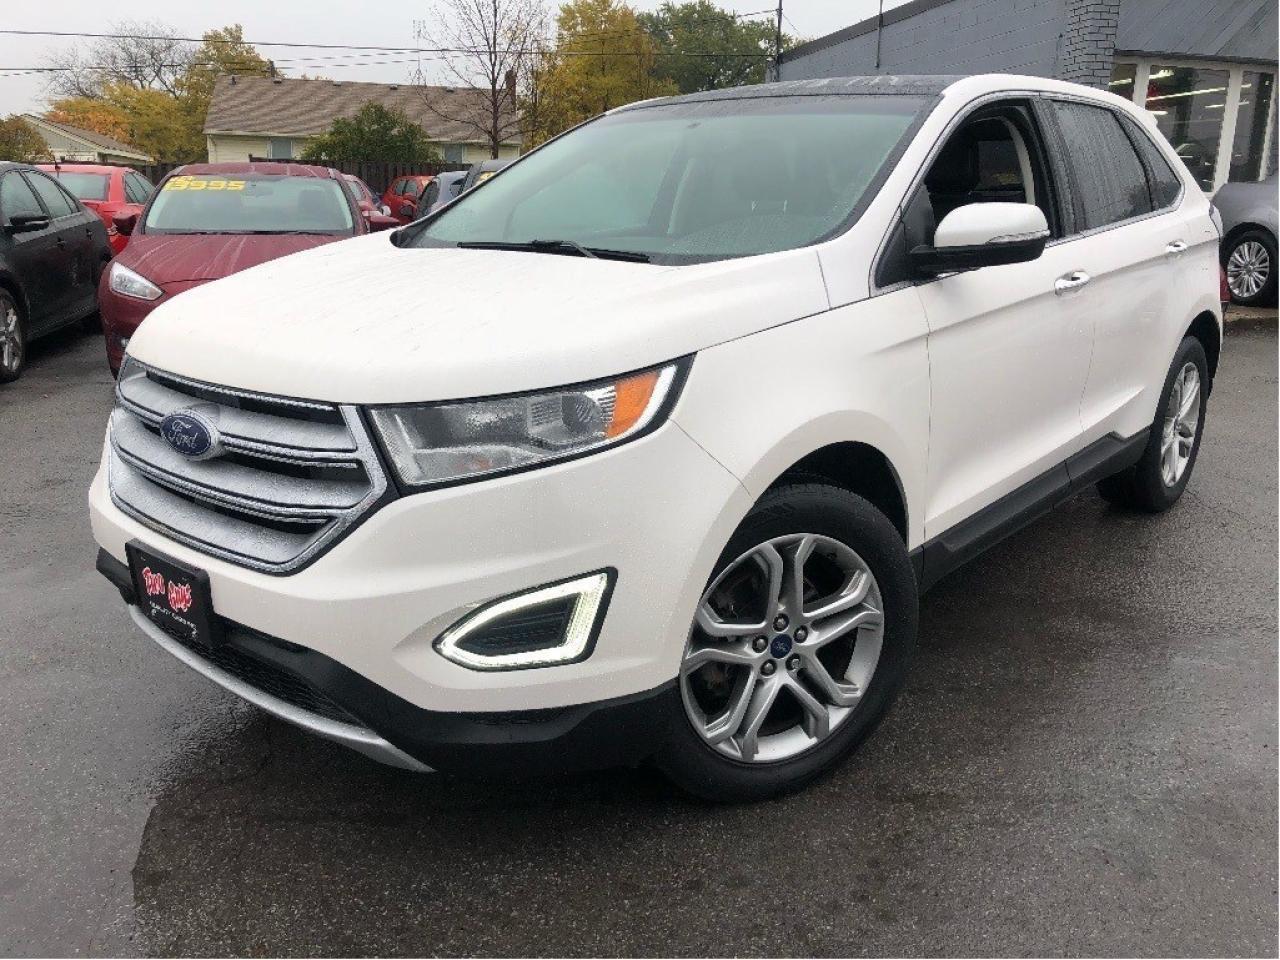 2015 Ford Edge Titanium - Ex-Lease -  - Navigation